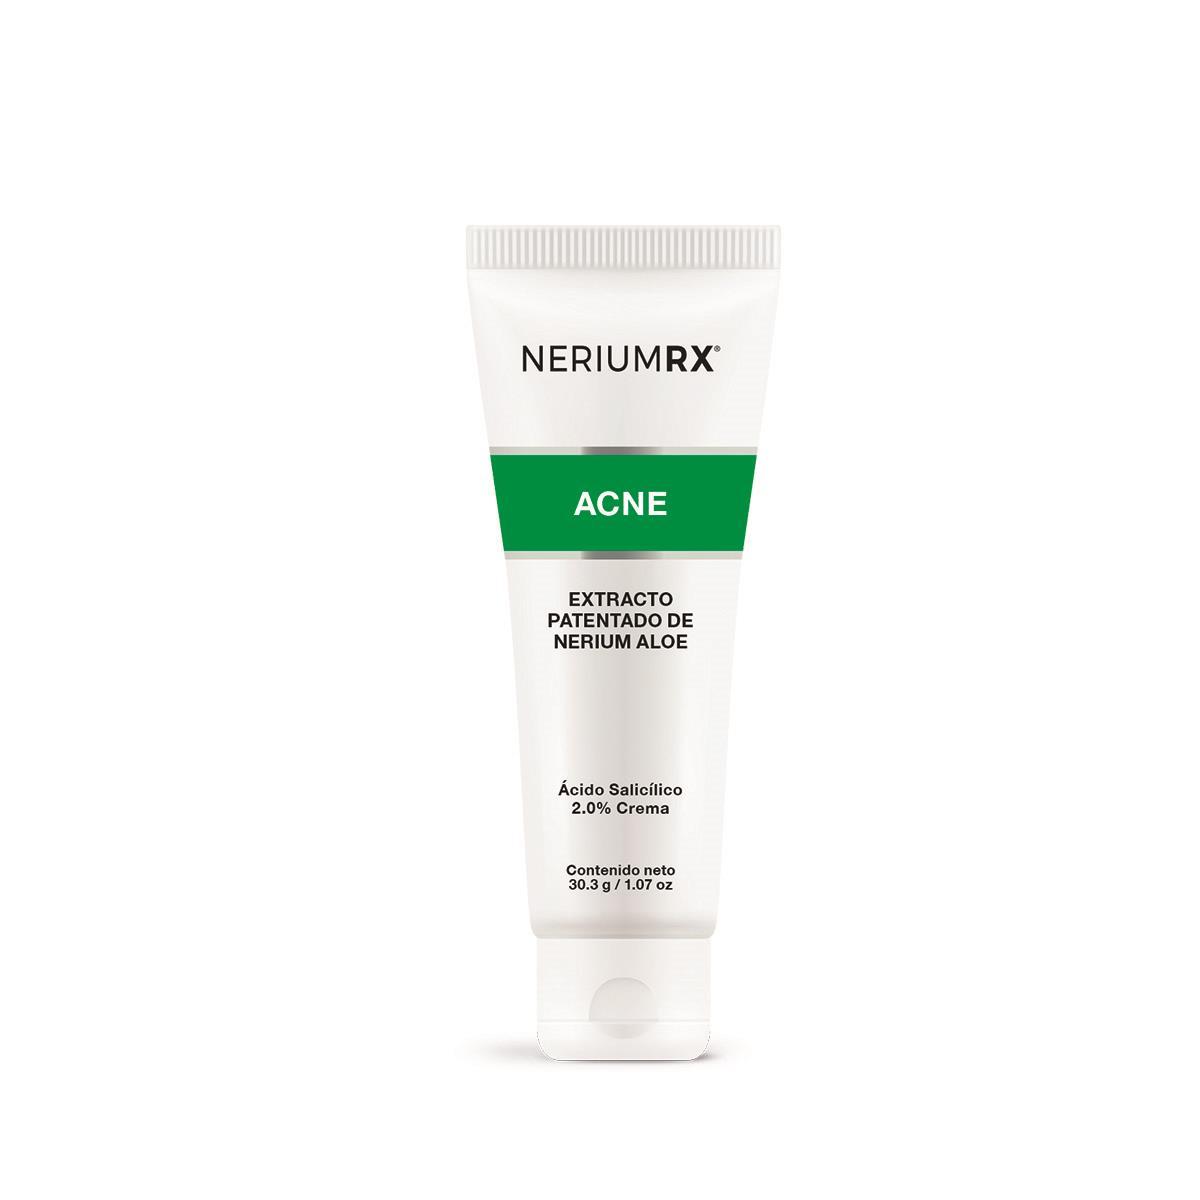 Neriumrx Acne 30.3G